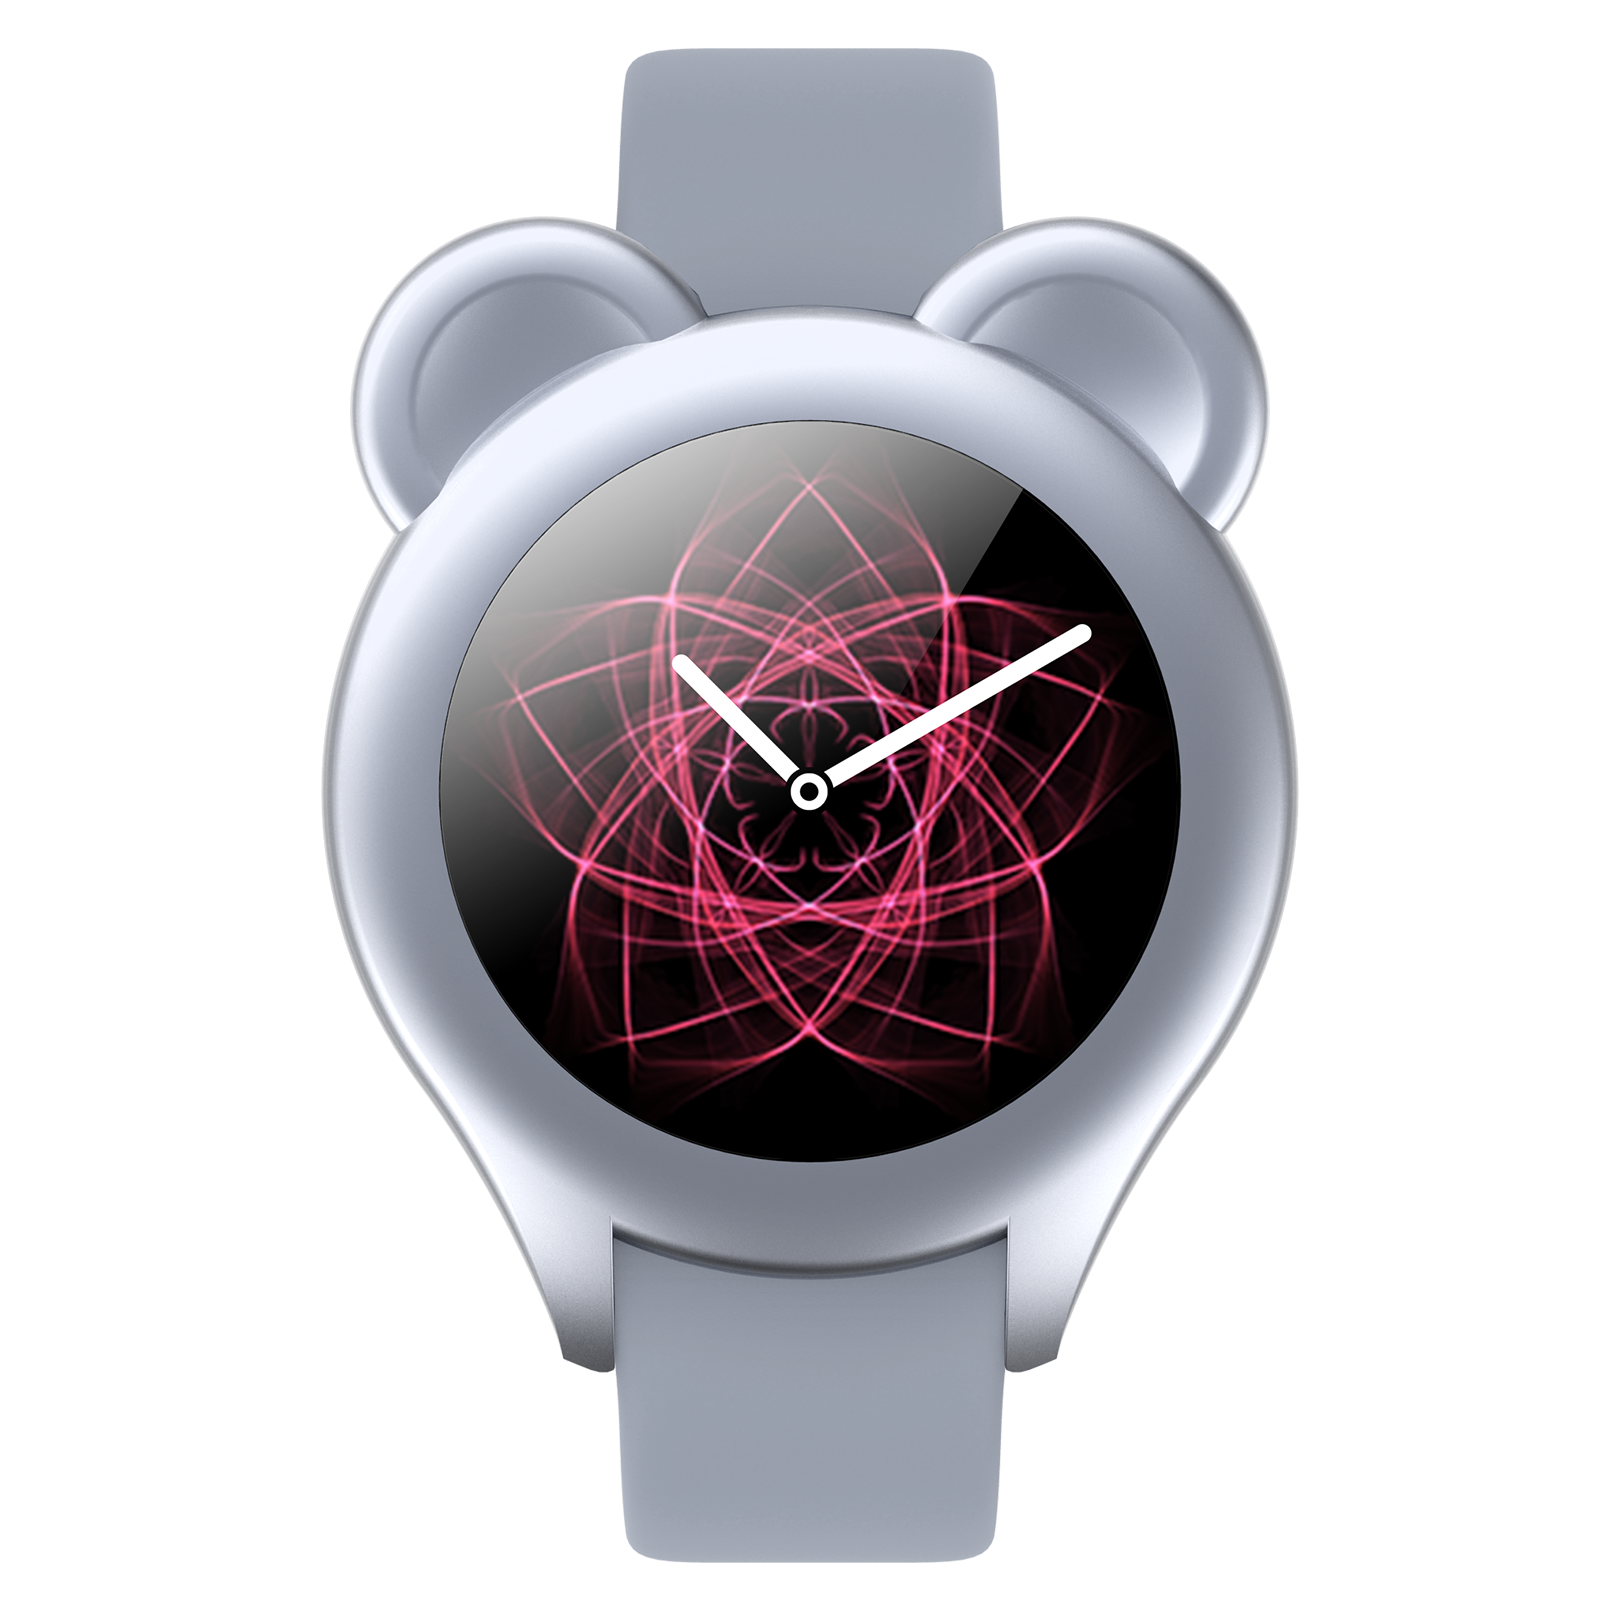 Shezhen China smart watch manufacturers do OEM ODM M99 cute Mickey heart rate waterproof smartwatch